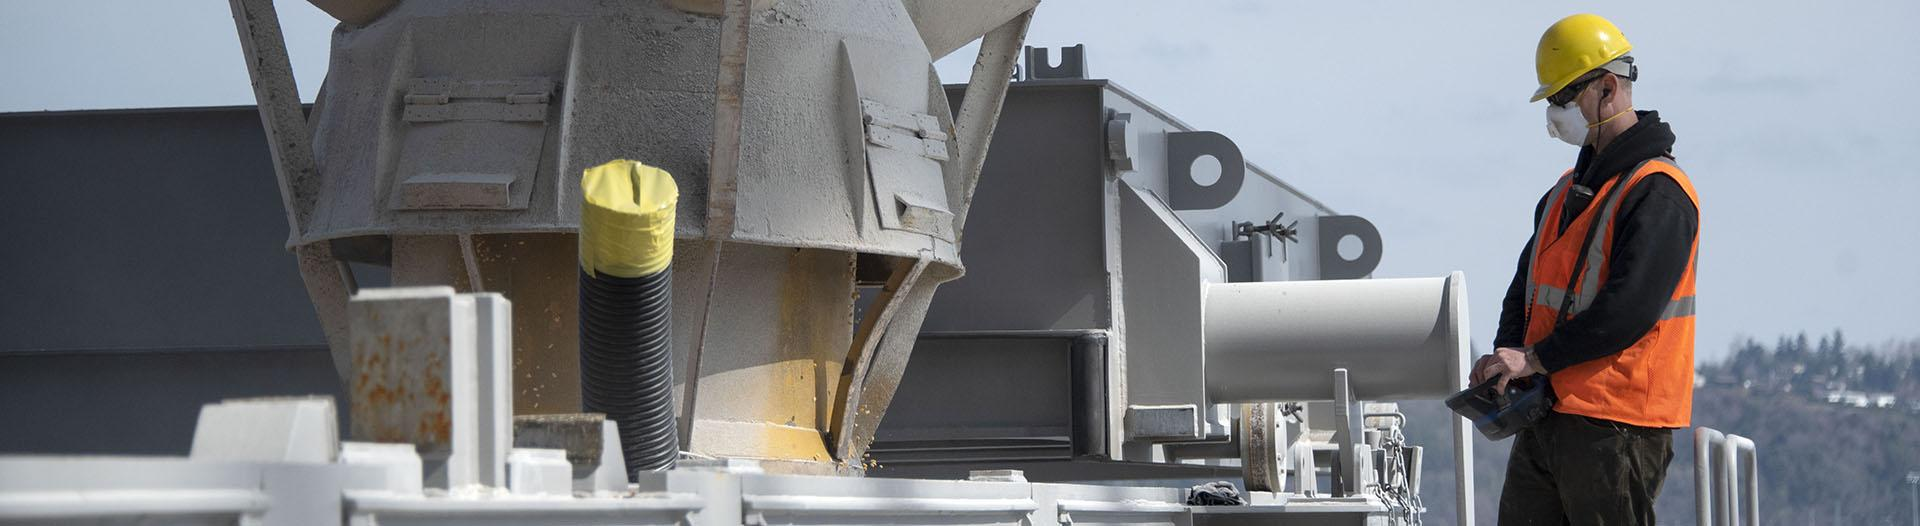 Longshore worker fills a bulk cago ship with grain